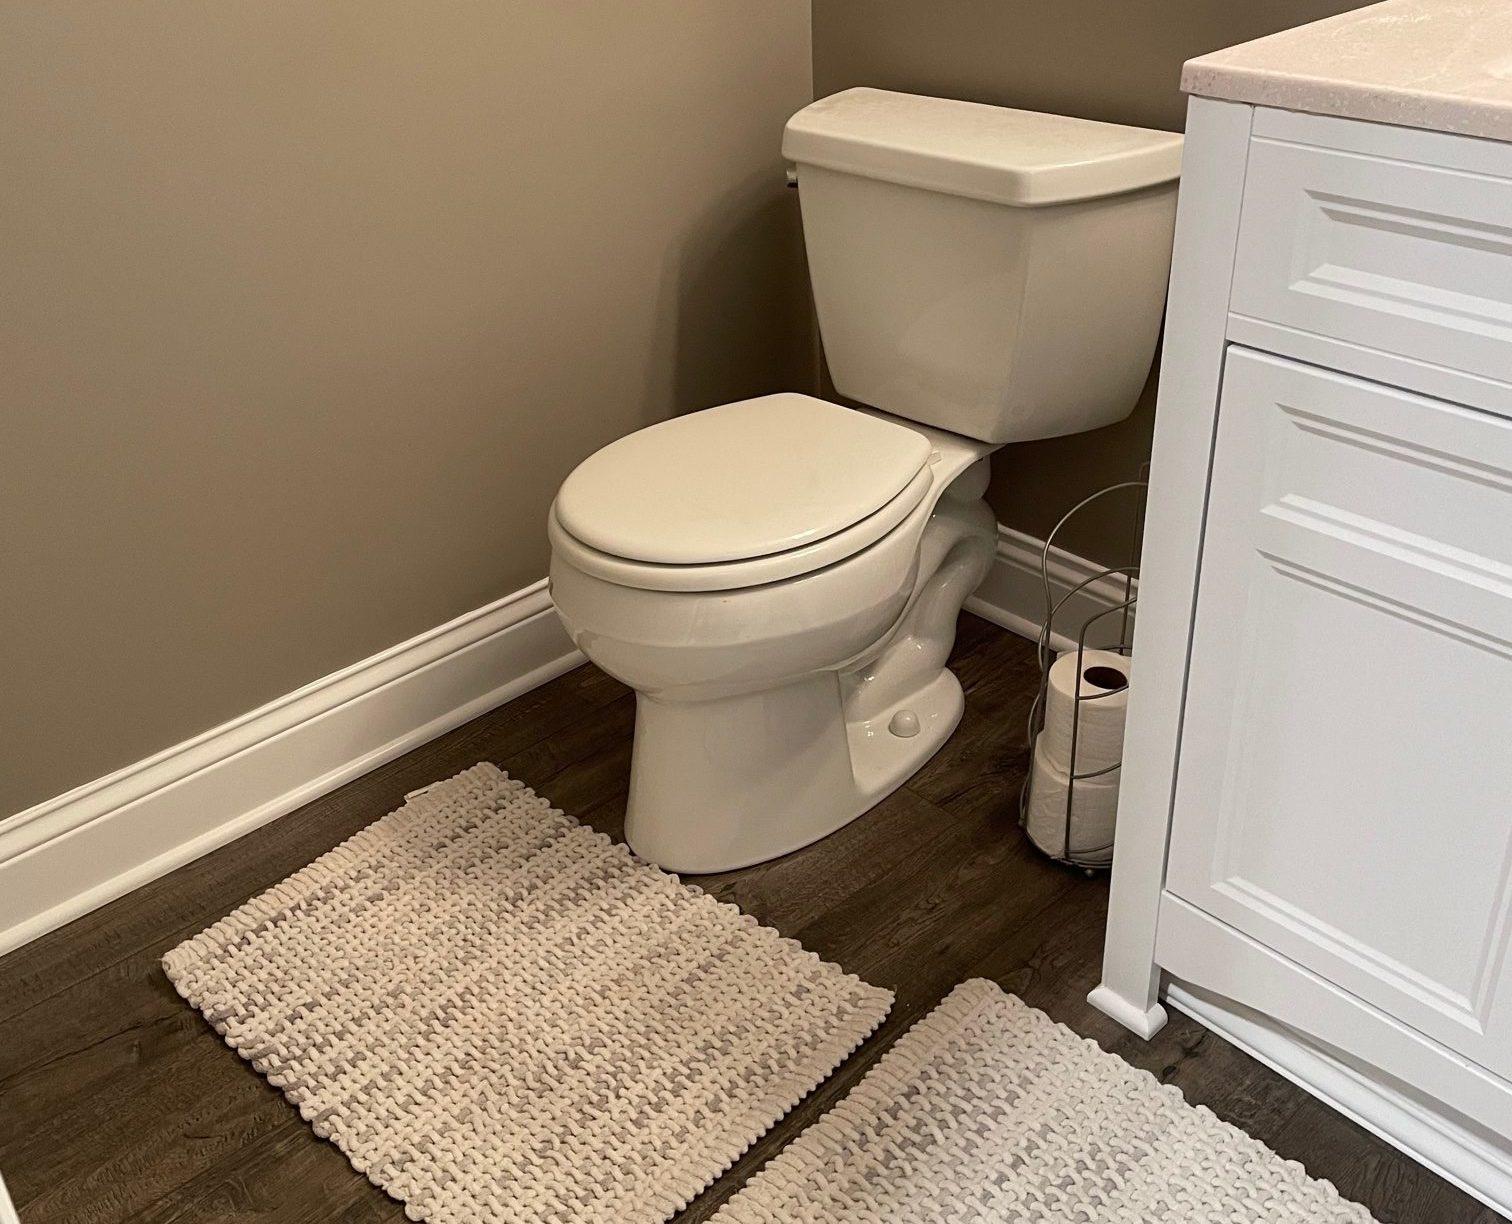 Laminate Installation in Bathroom